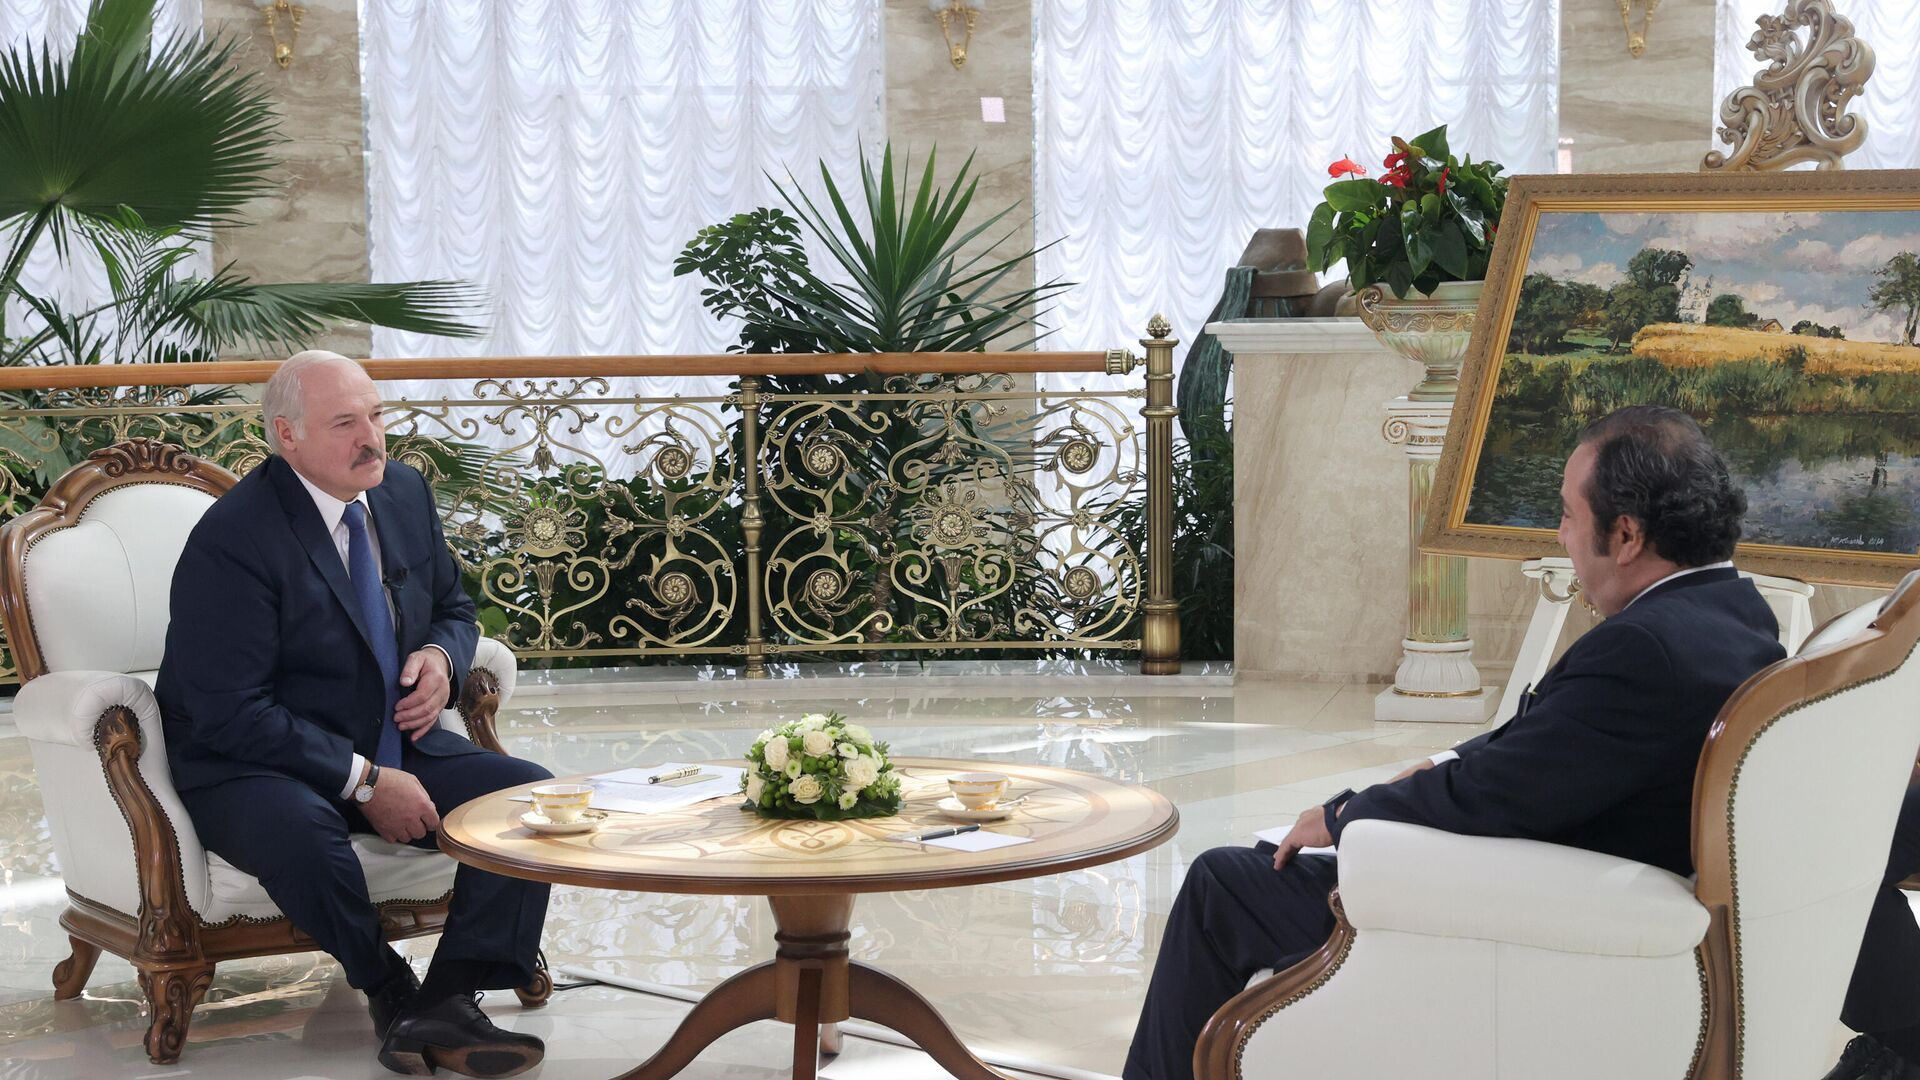 Интервью президента Беларуси Александра Лукашенко телеканалу Sky News Arabia - Sputnik Беларусь, 1920, 21.07.2021